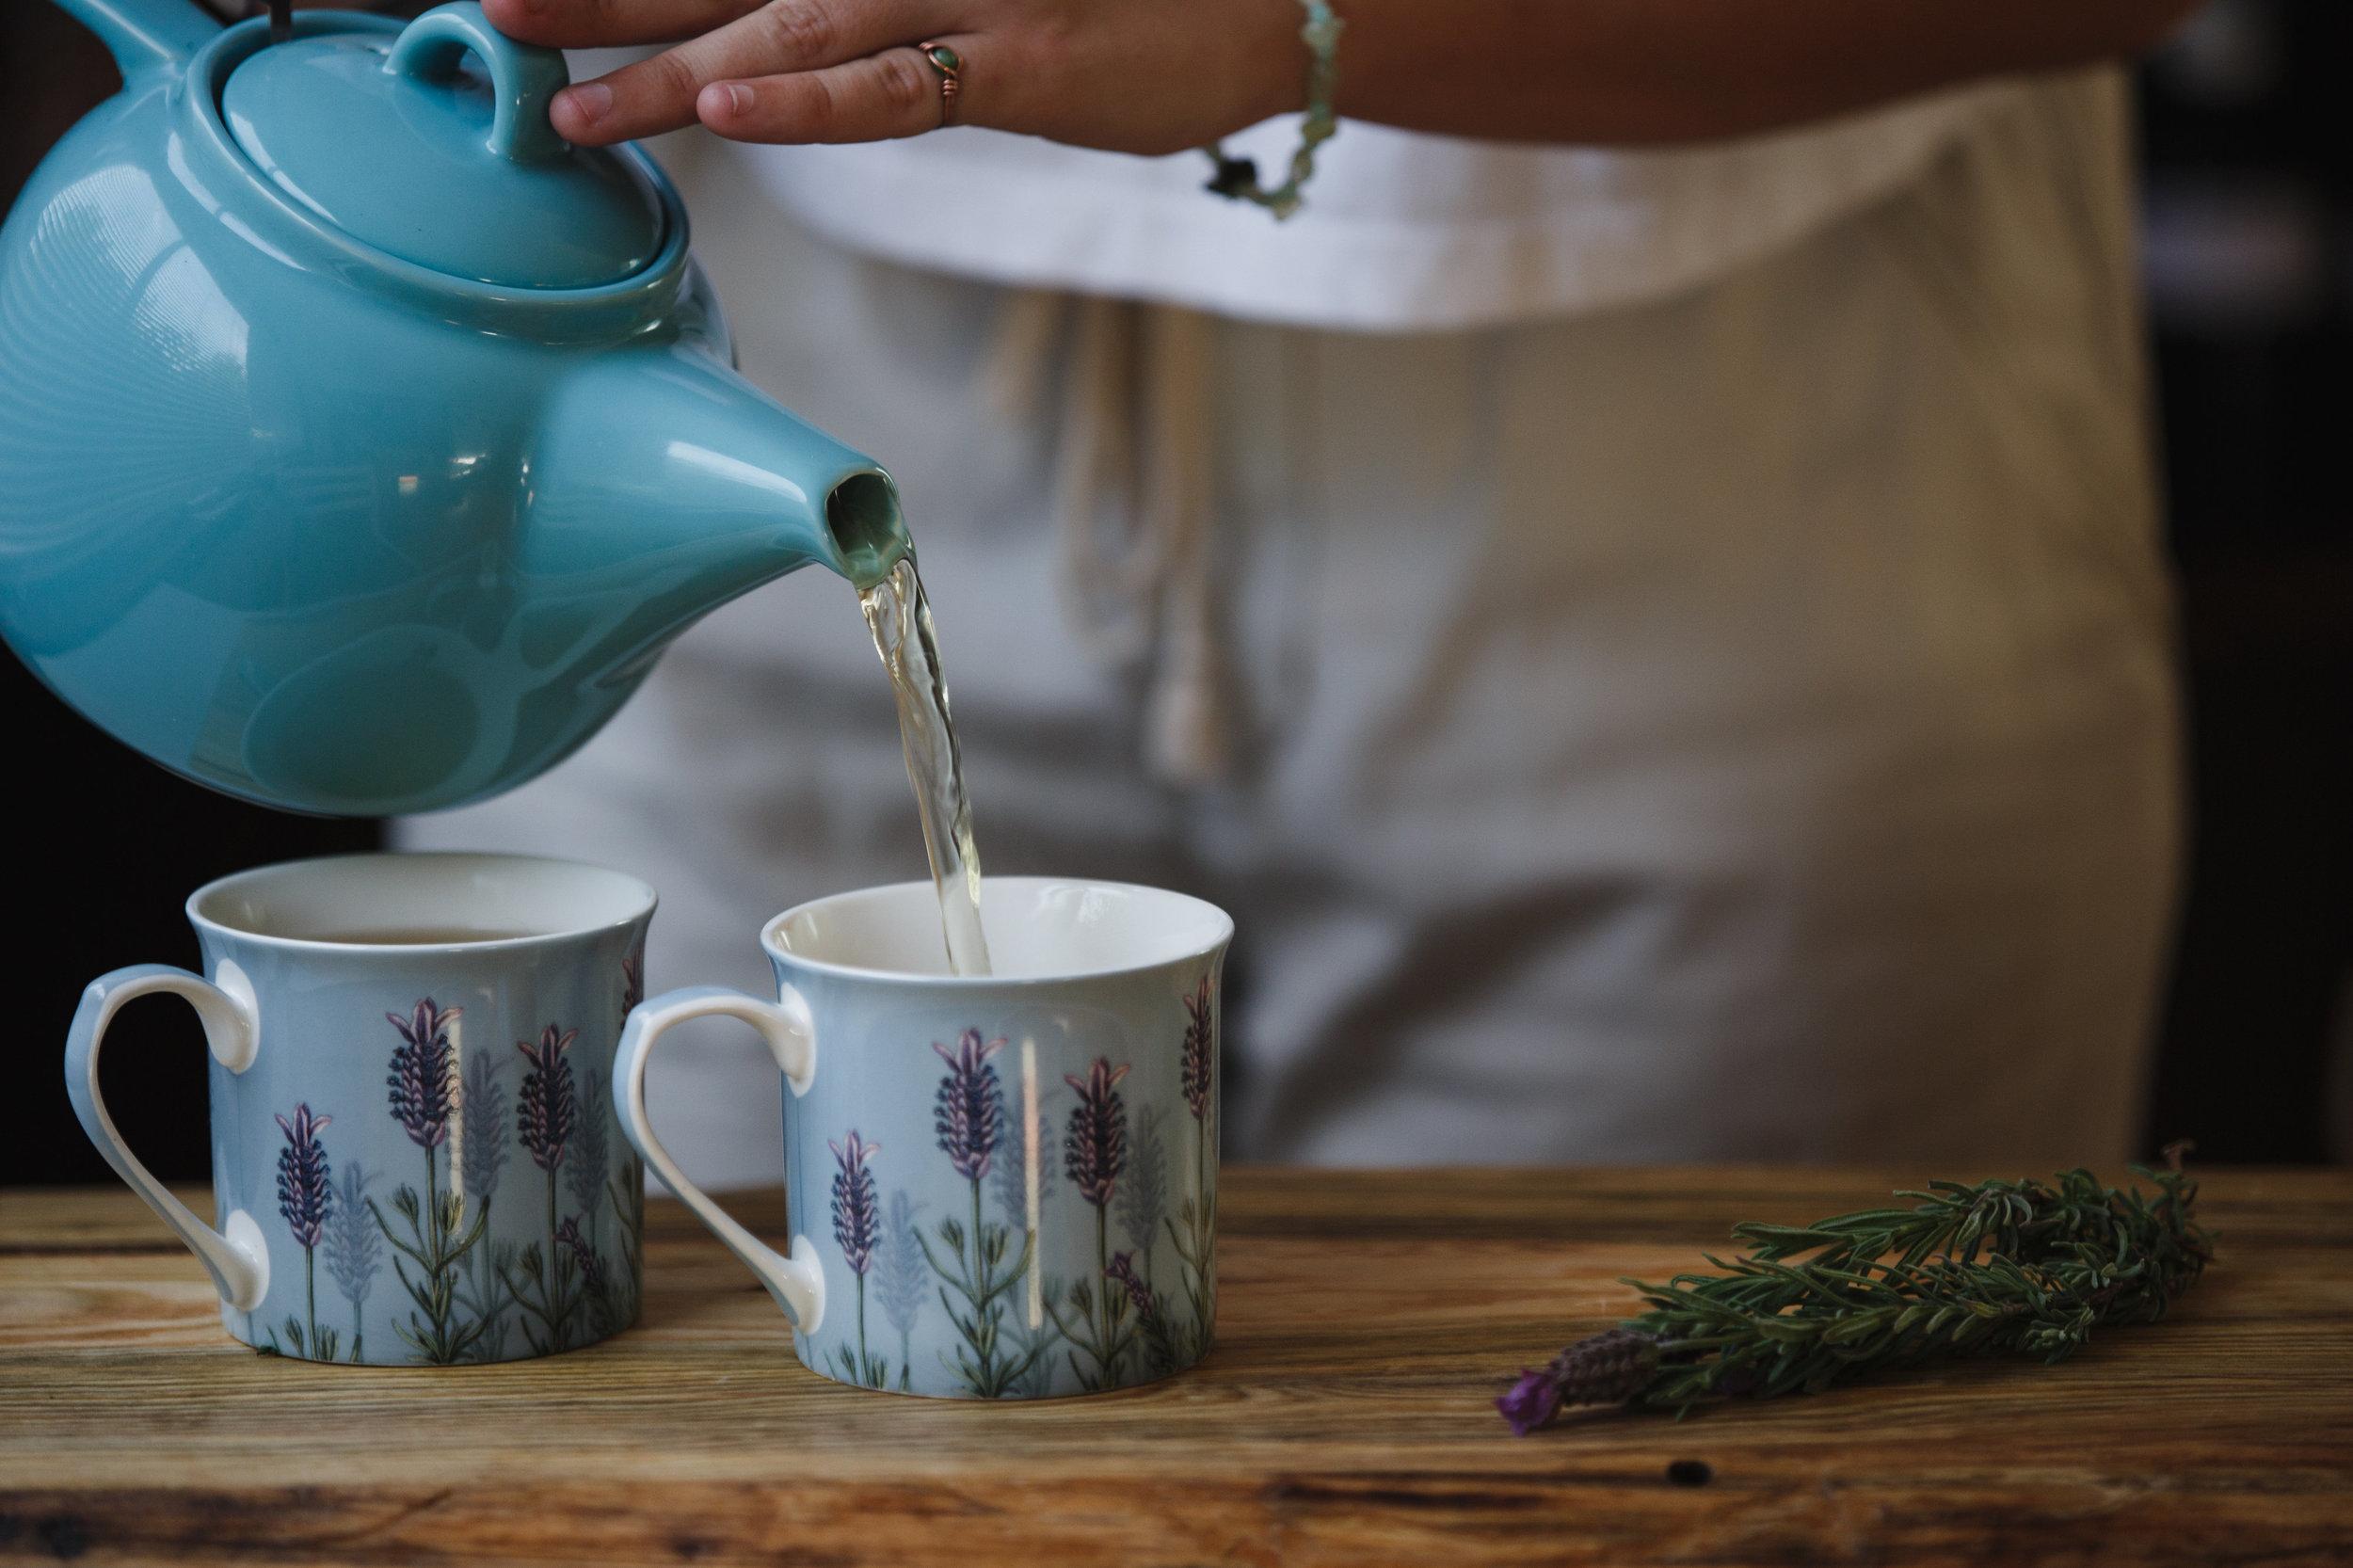 Medicinal tea being poured